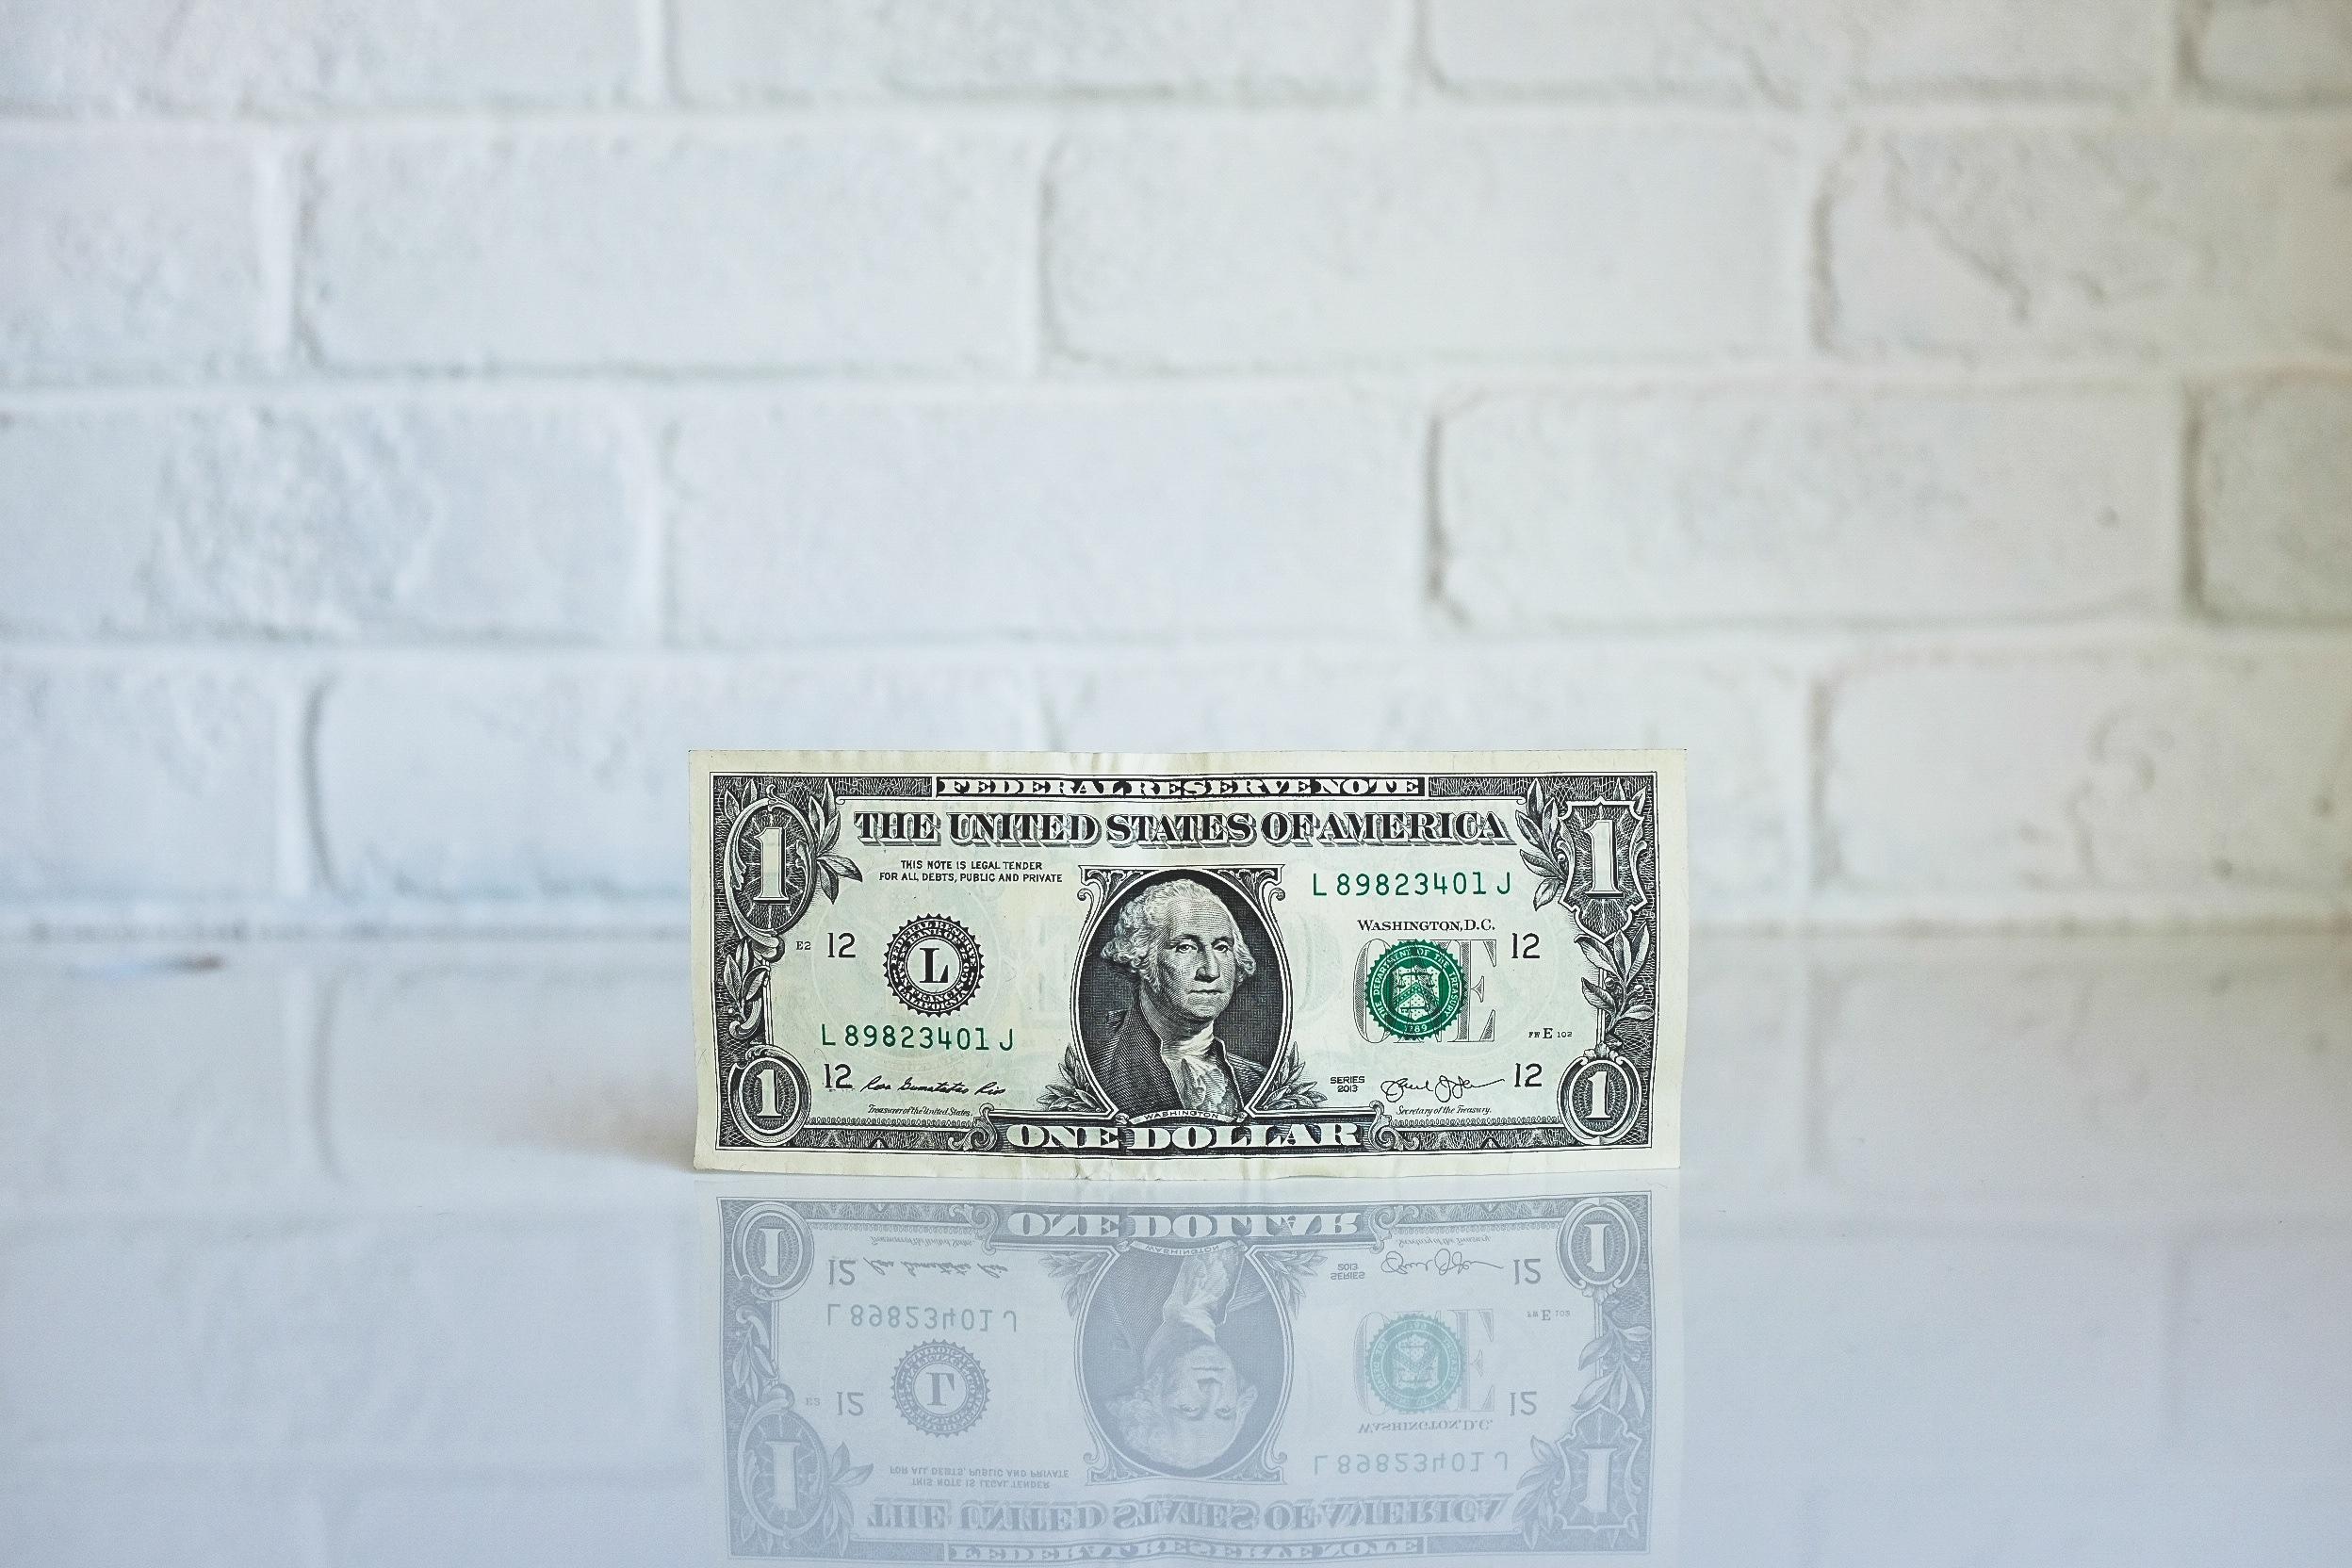 אם בכסף עסקינן